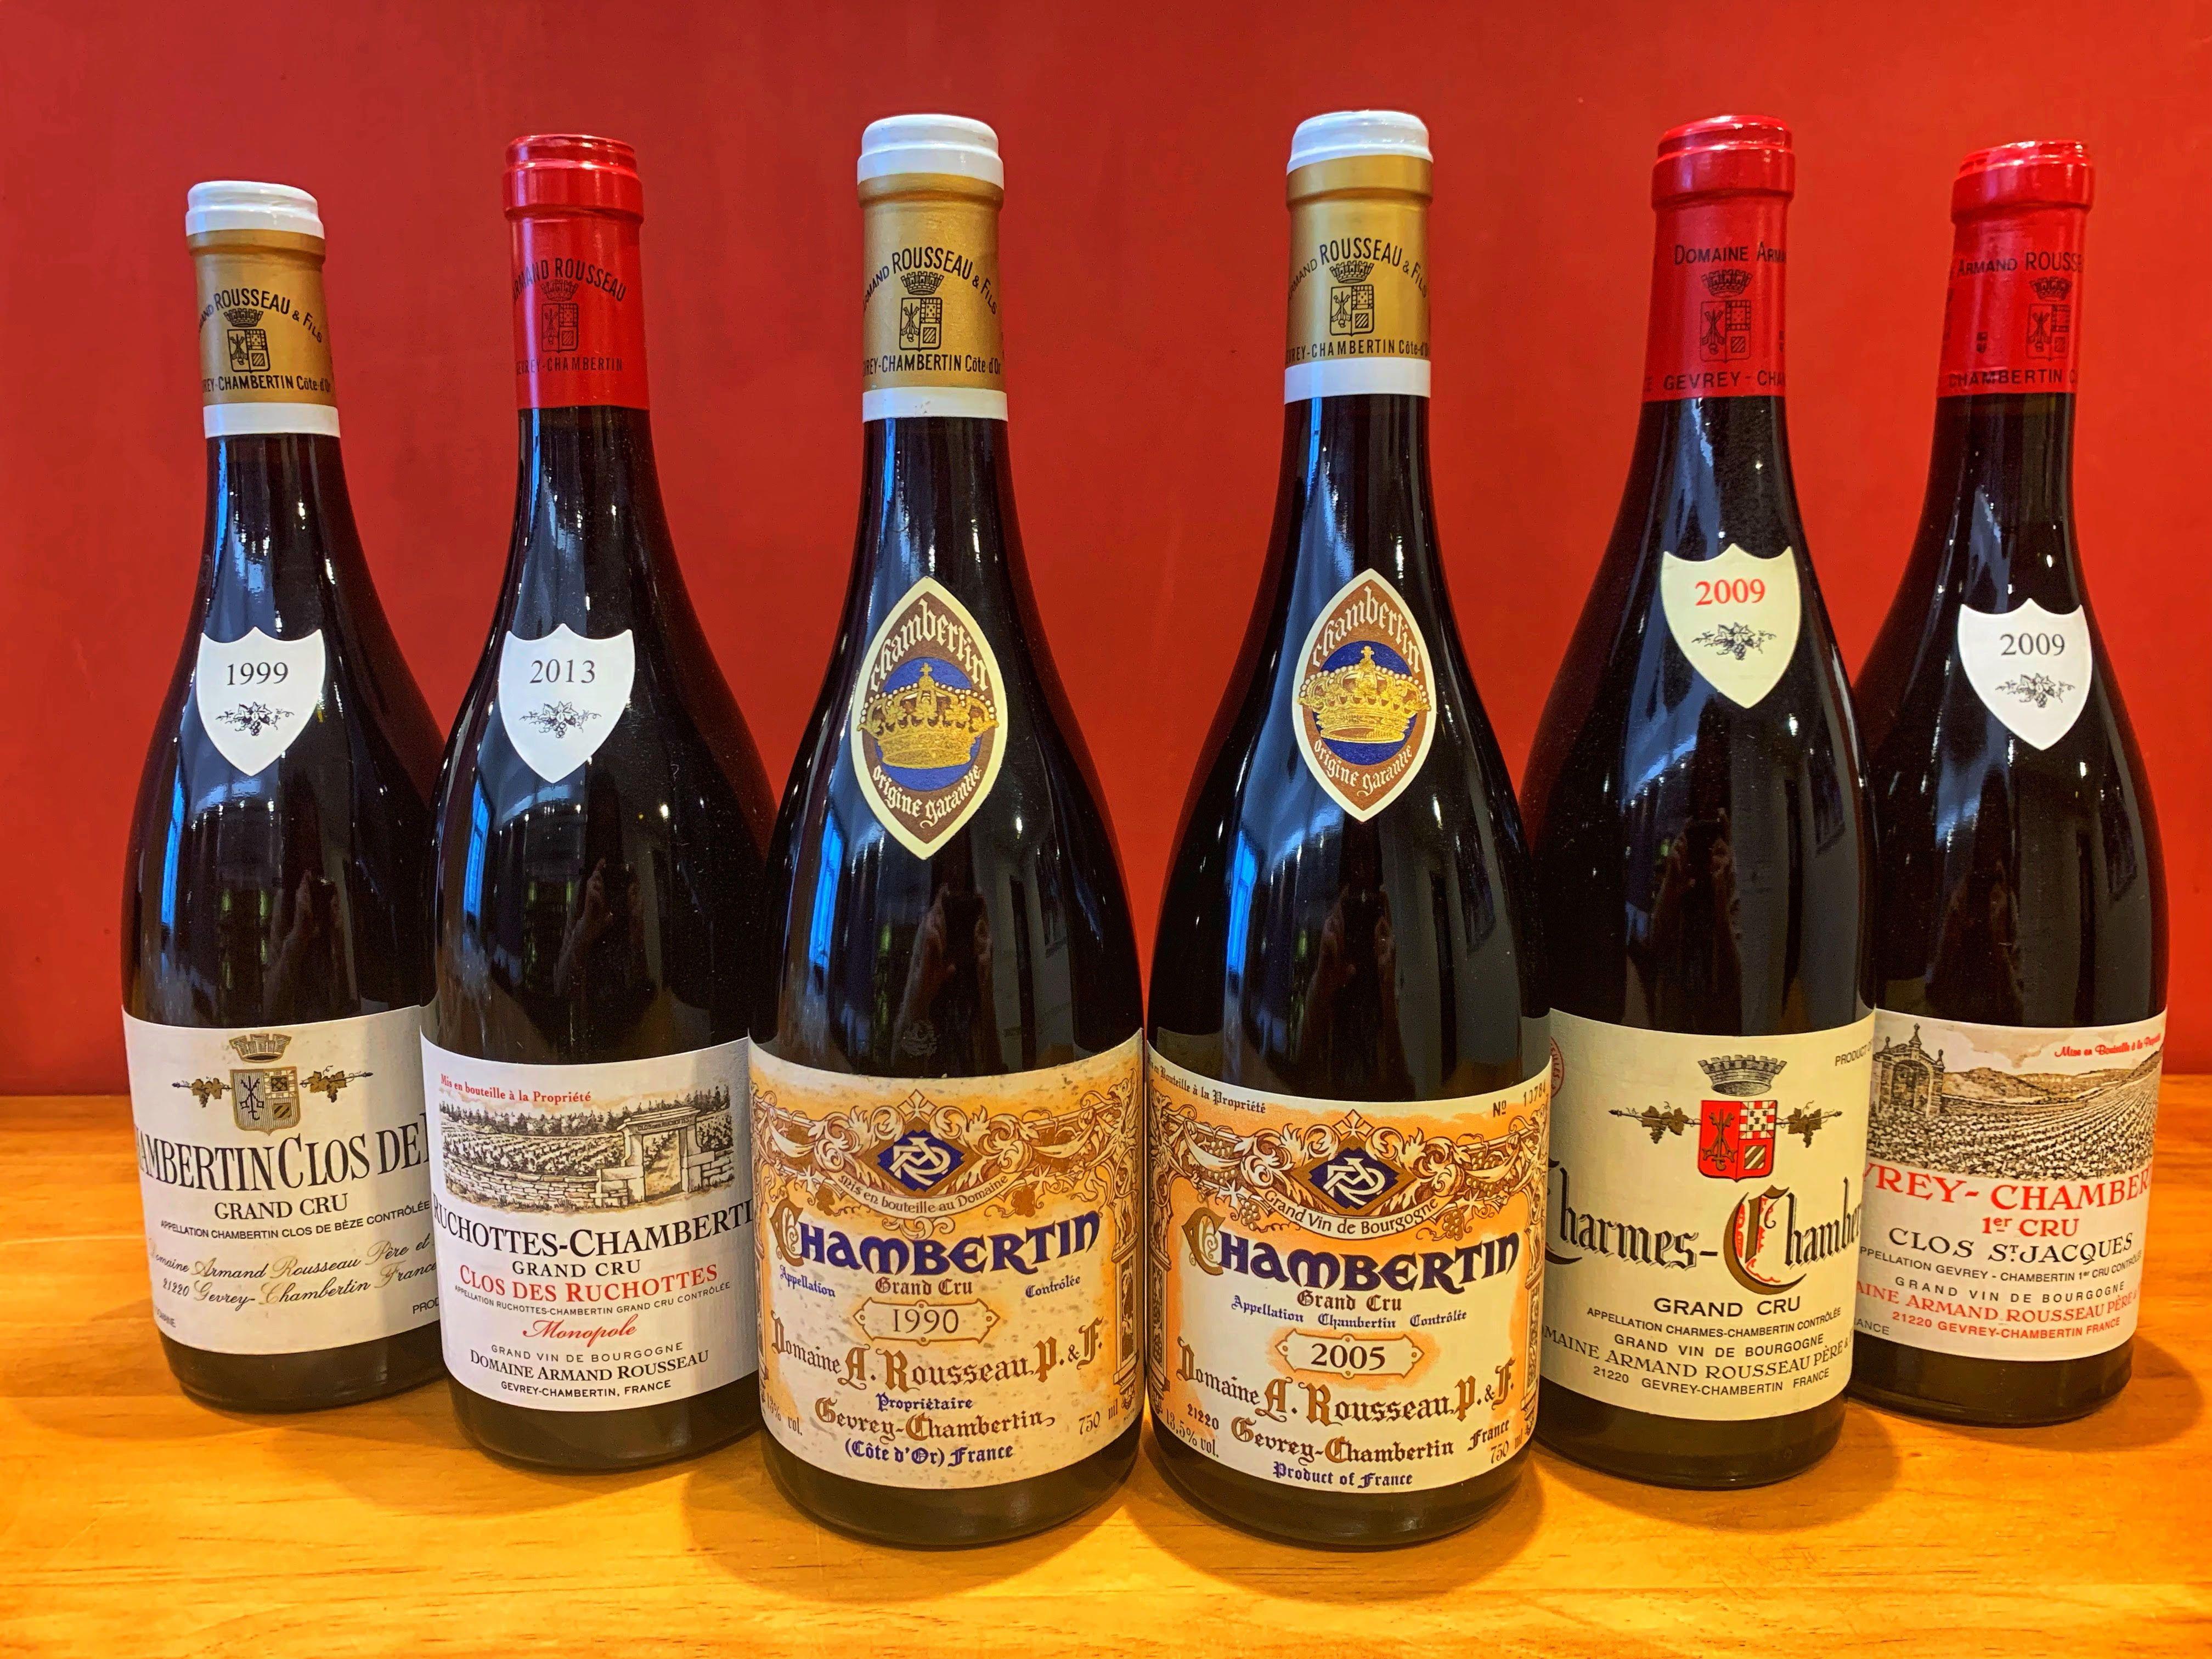 Auction Graded Armand Rousseau On Sale Winemaking Wine Cellar Robert Parker